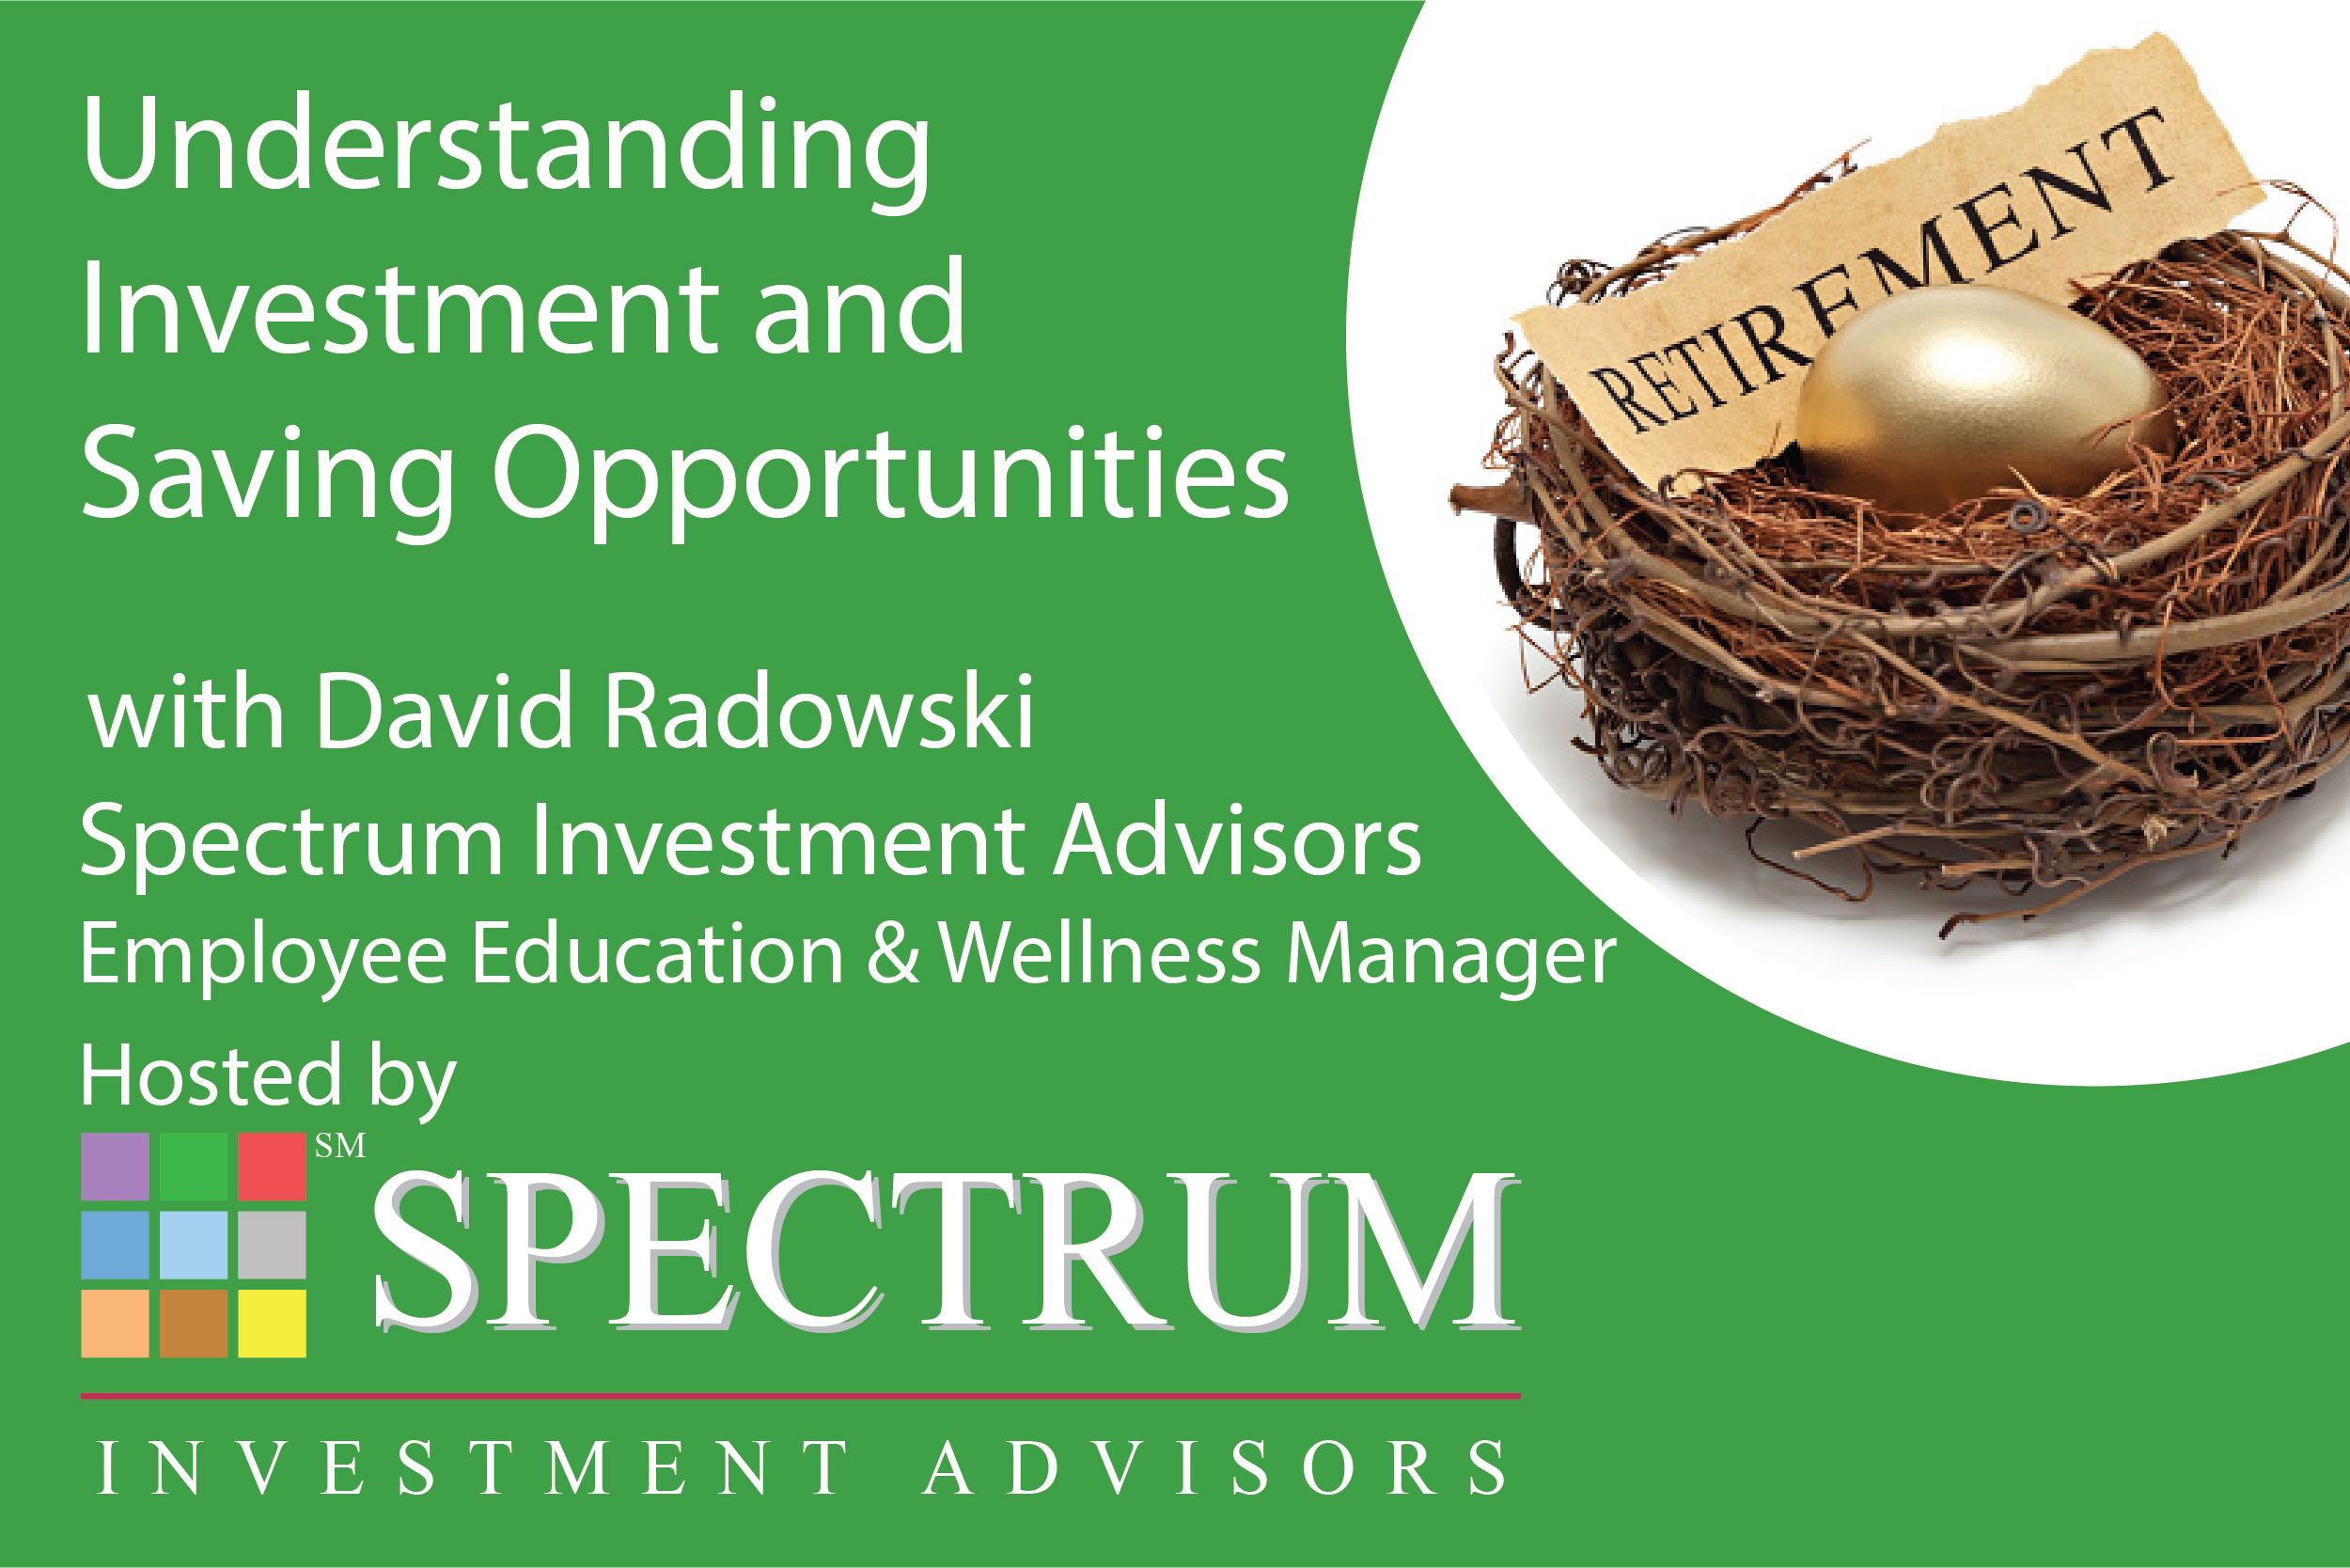 SIA Website David Radowski Understanding Investment and Saving Opportunities (revised)-01